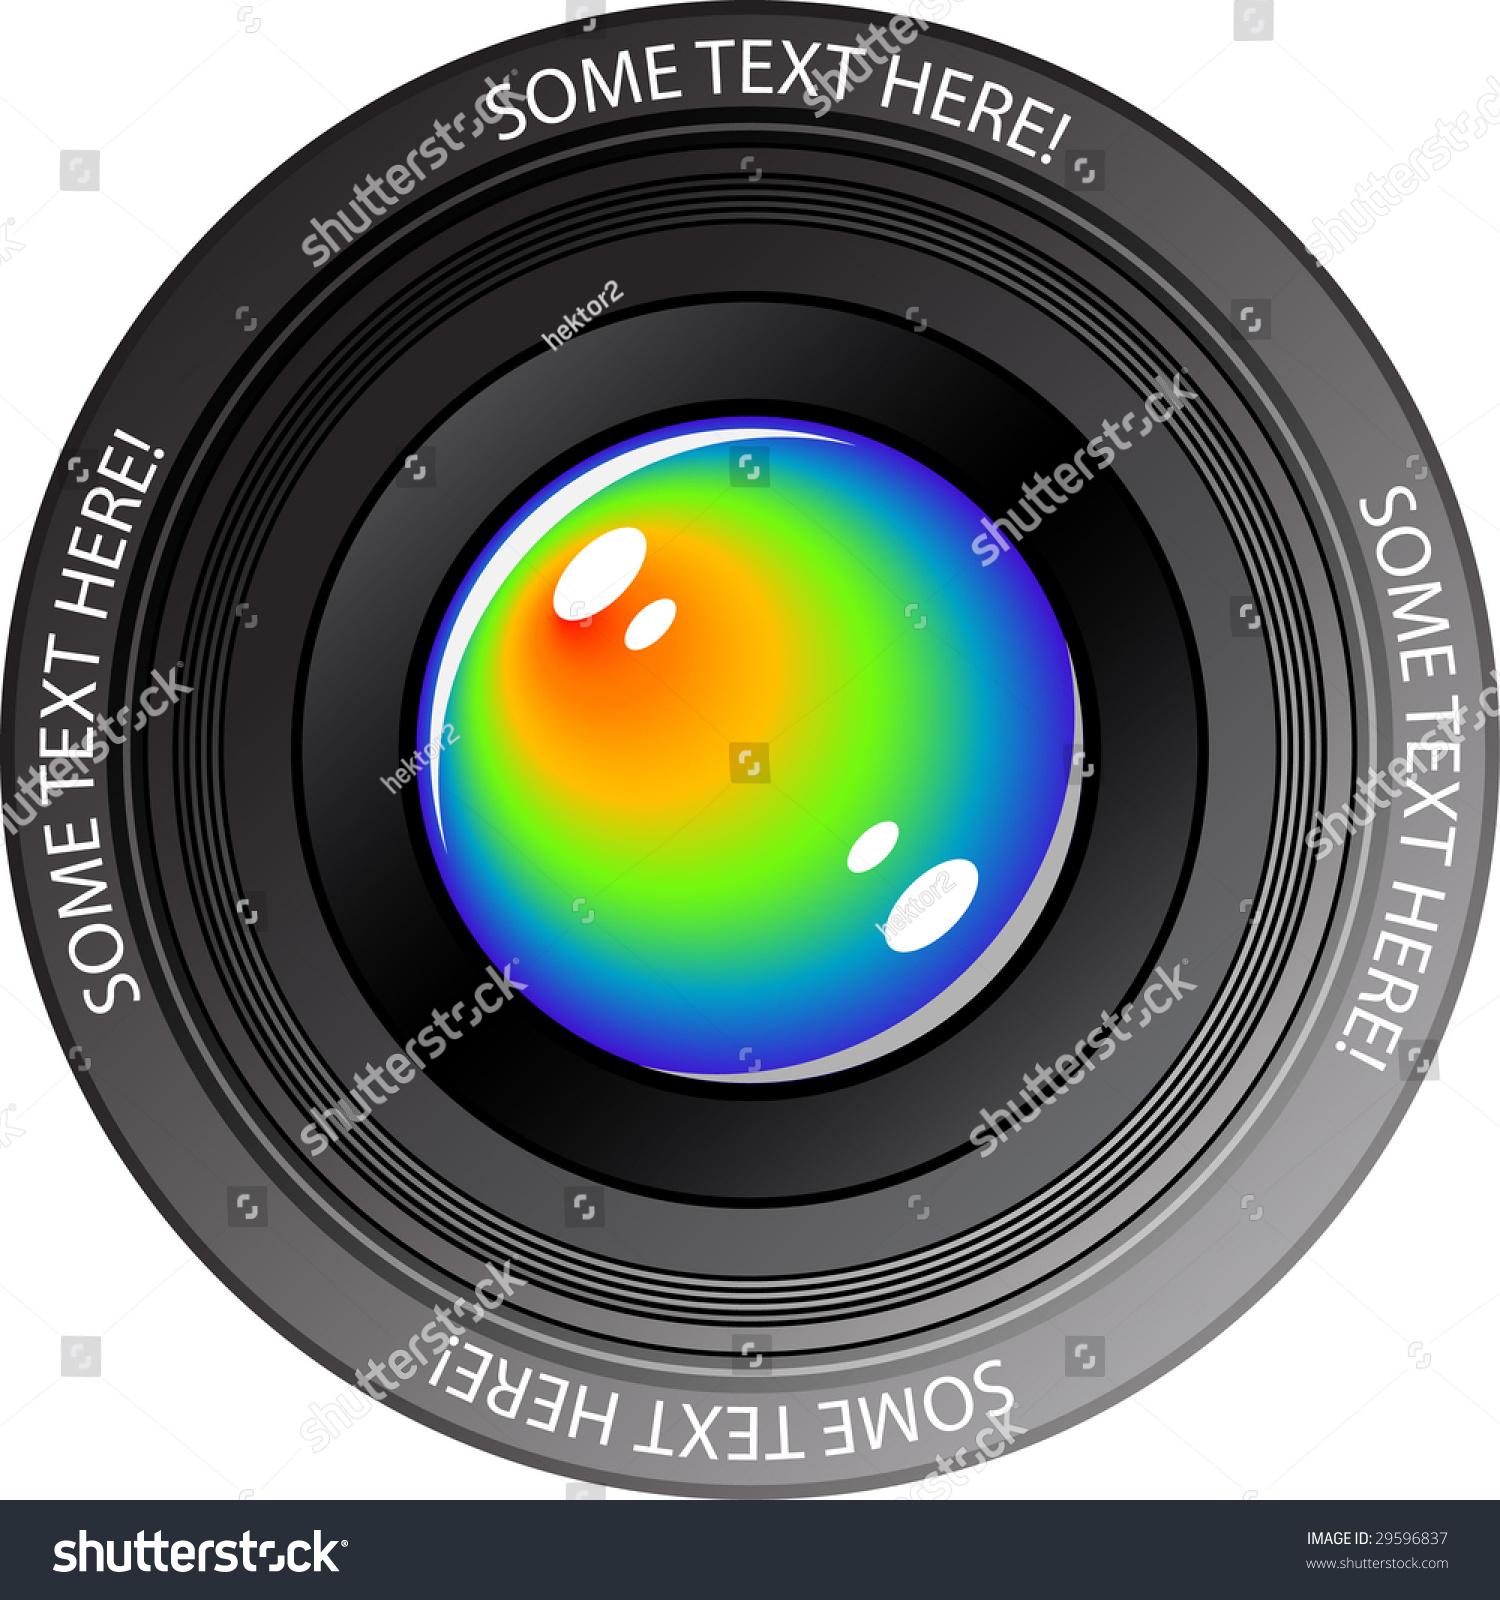 Camera lens - Wikipedia